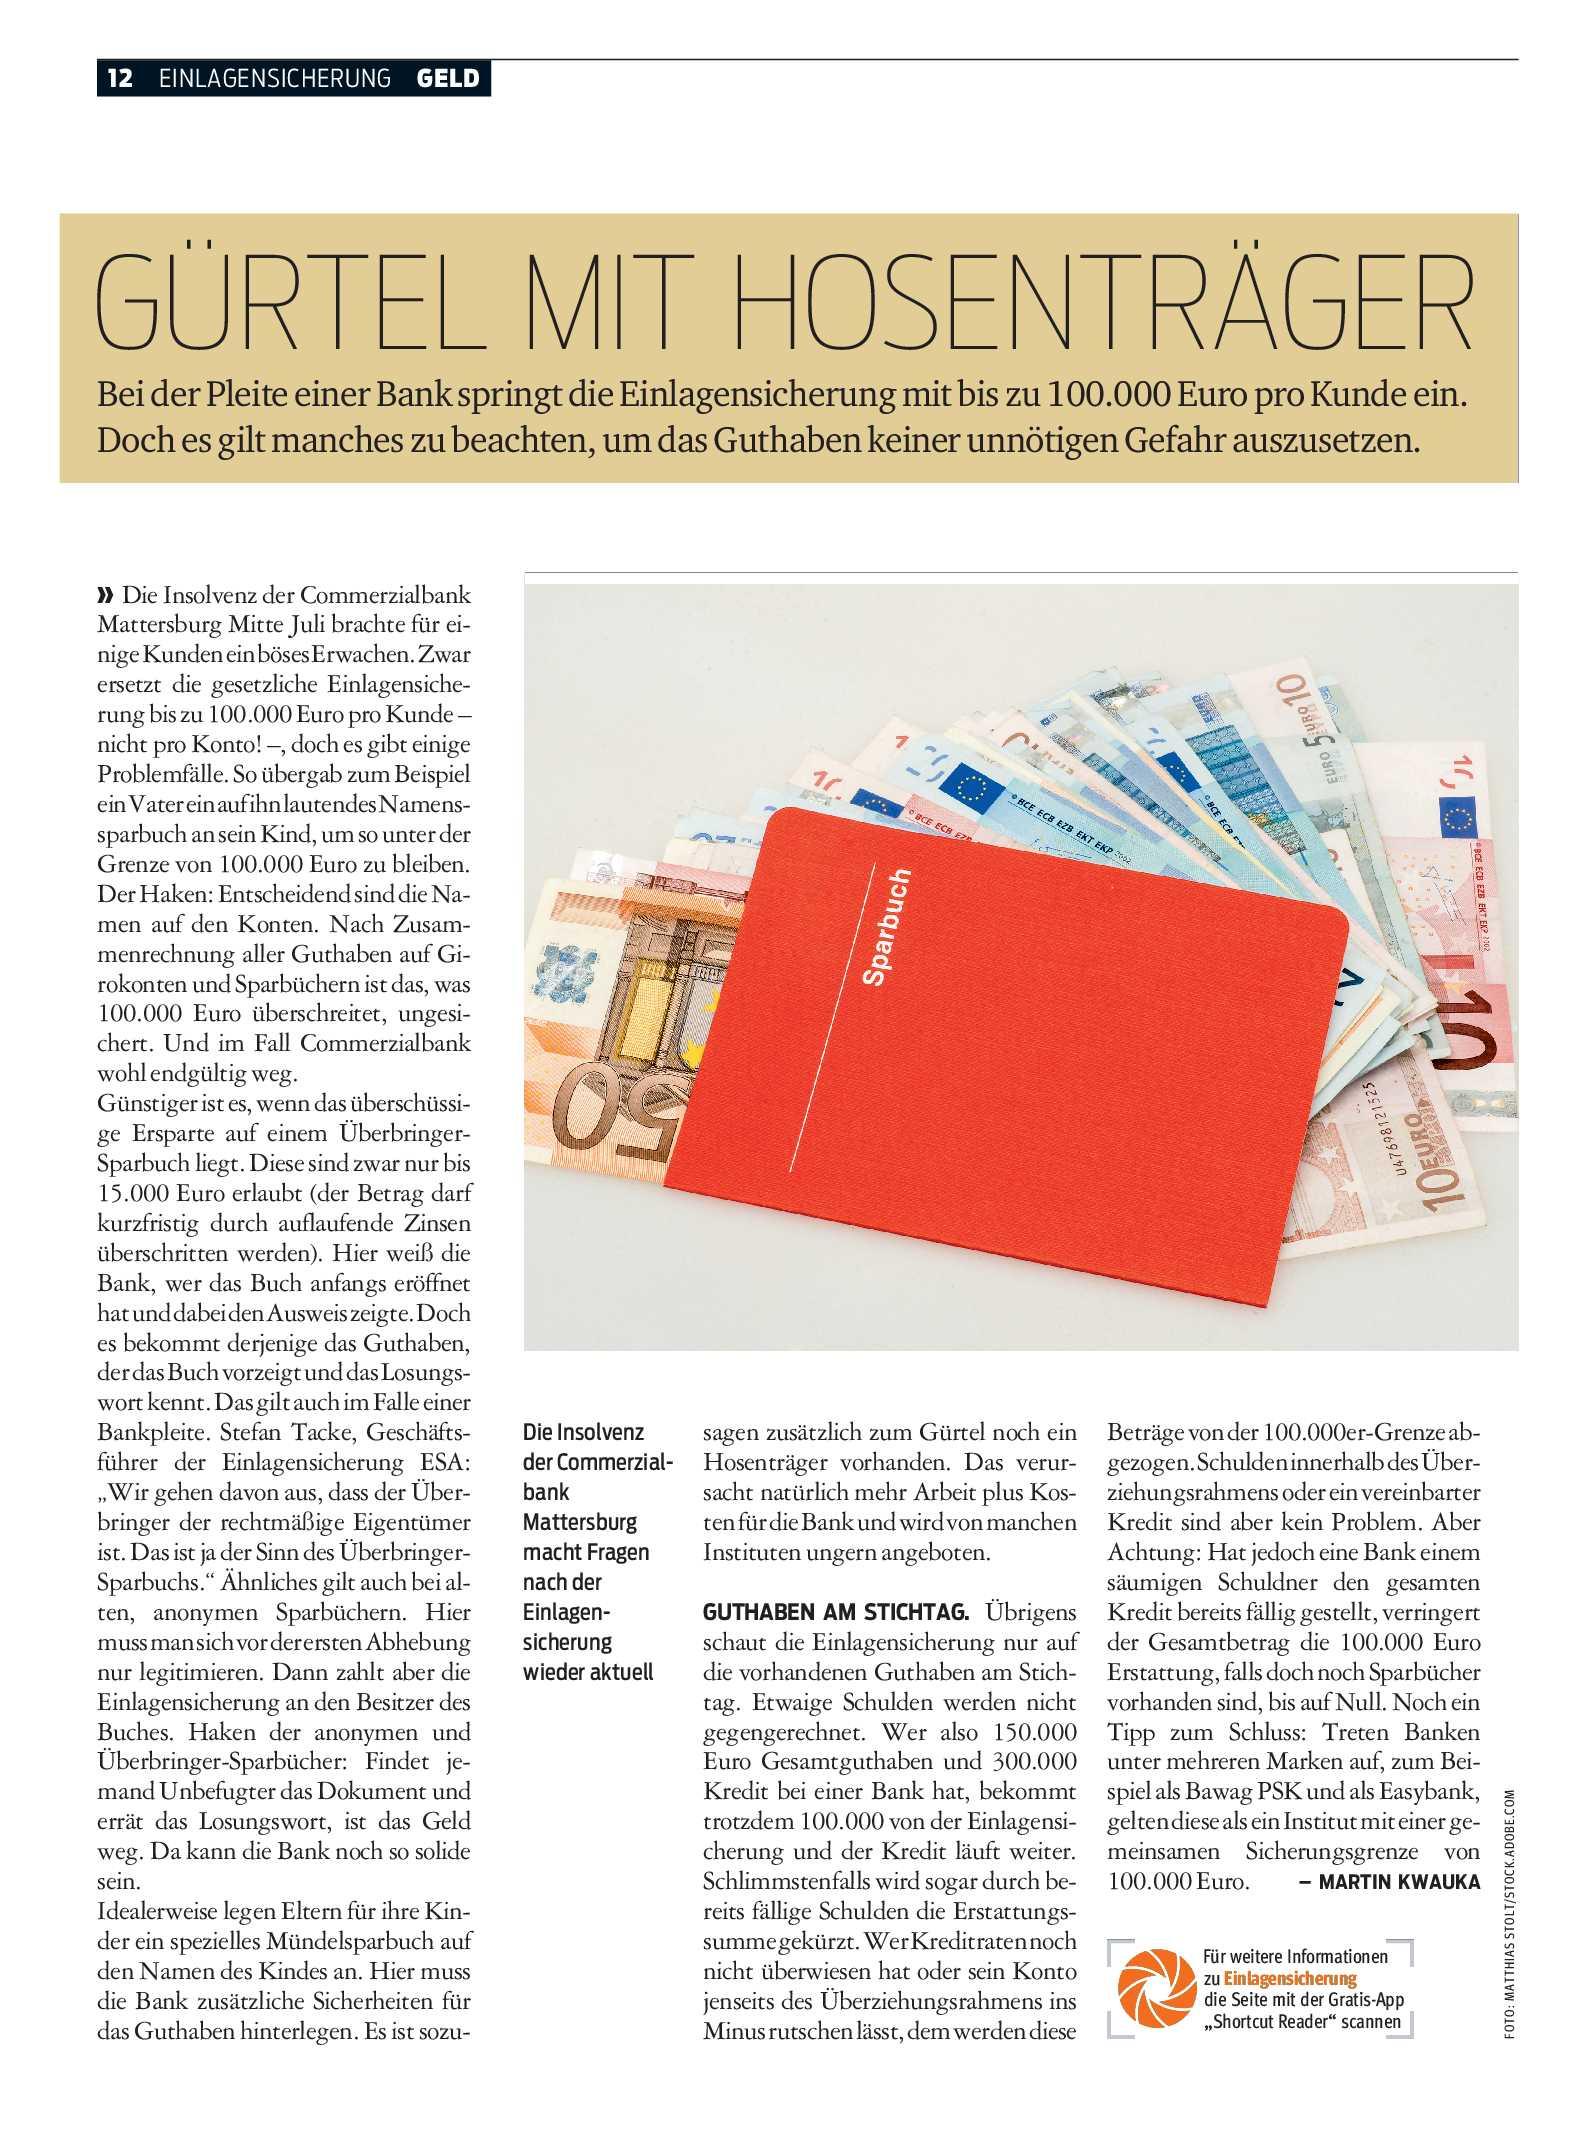 public/epaper/imported/20201118/kurier/magazin/magazin_20201118_012.jpg